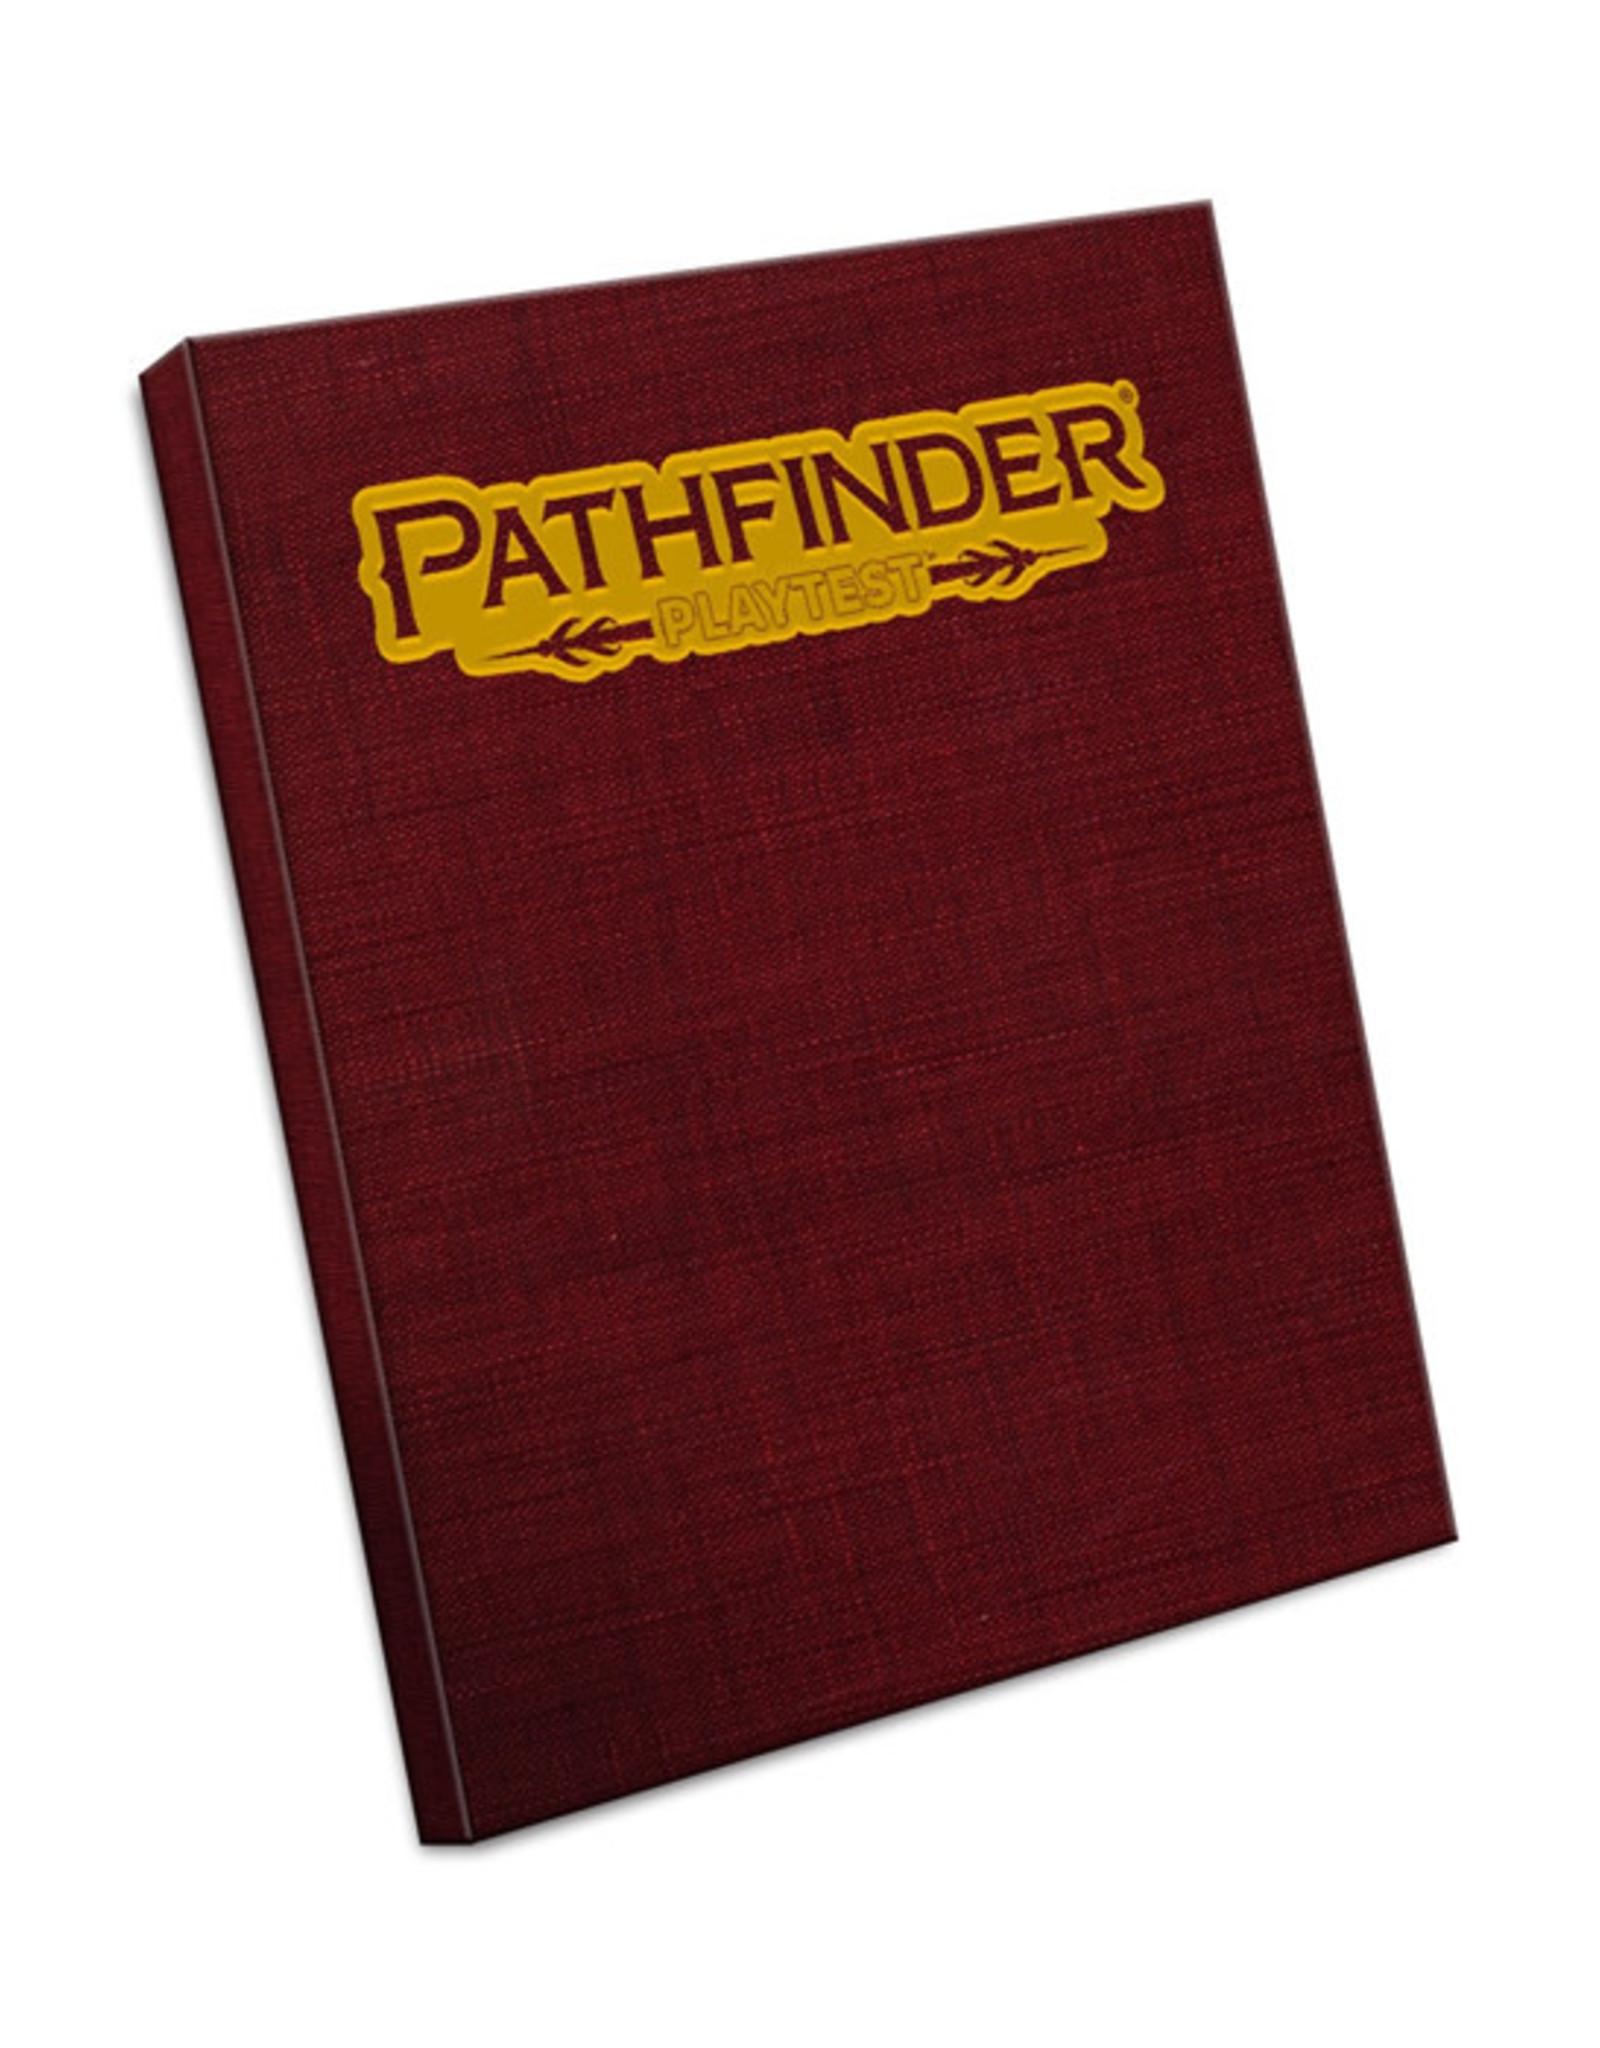 Pathfinder Pathfinder: 2nd Edition - Playtest - Rulebook (Special Edition)